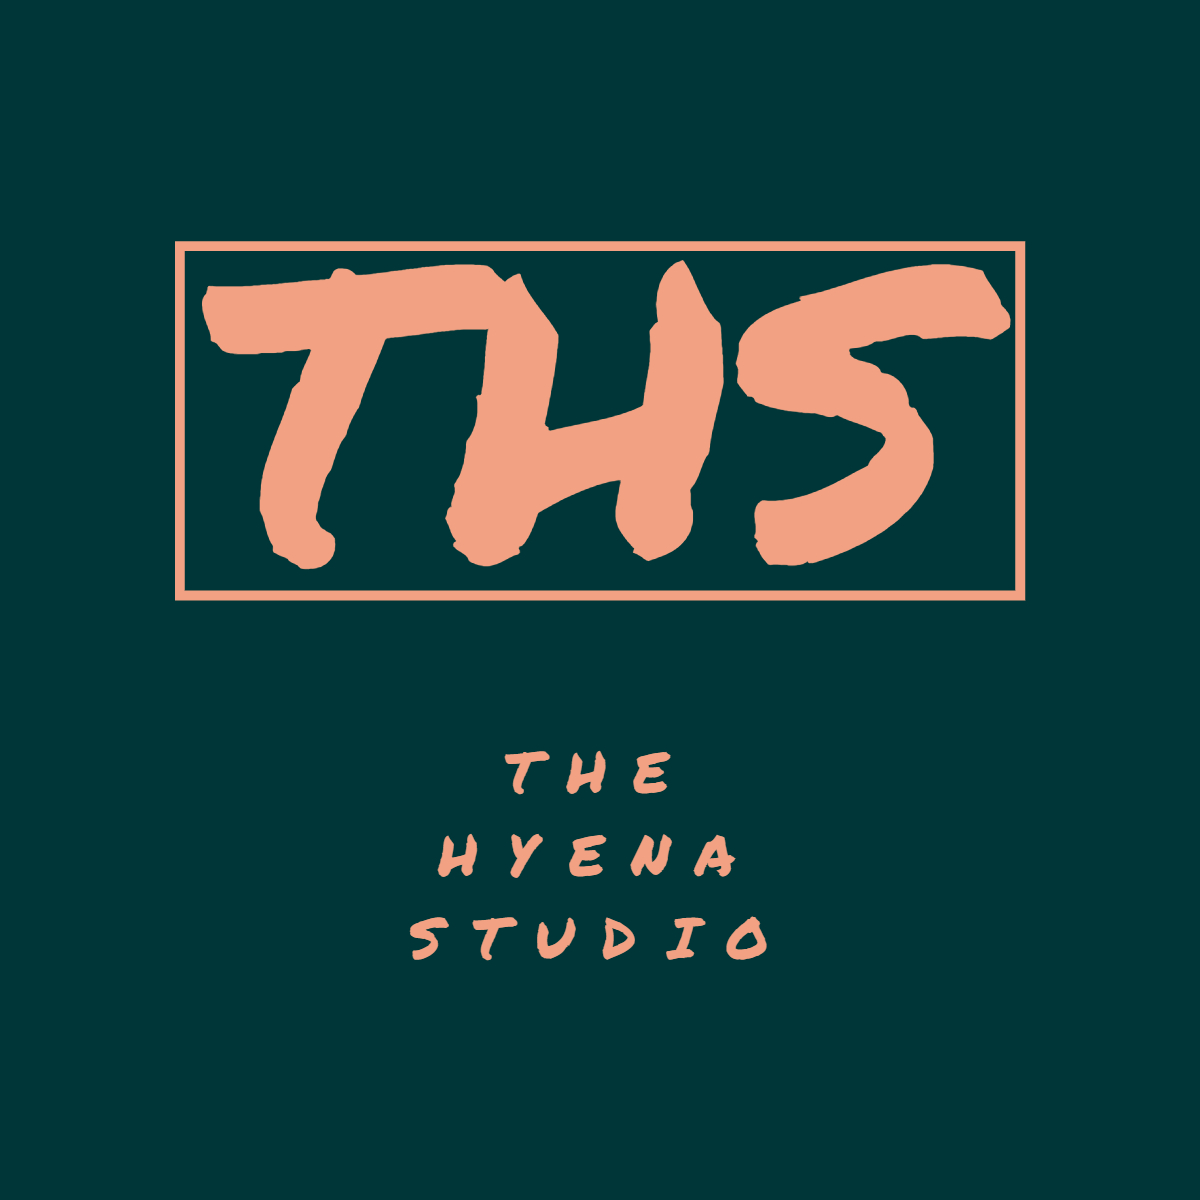 The HYENA studio